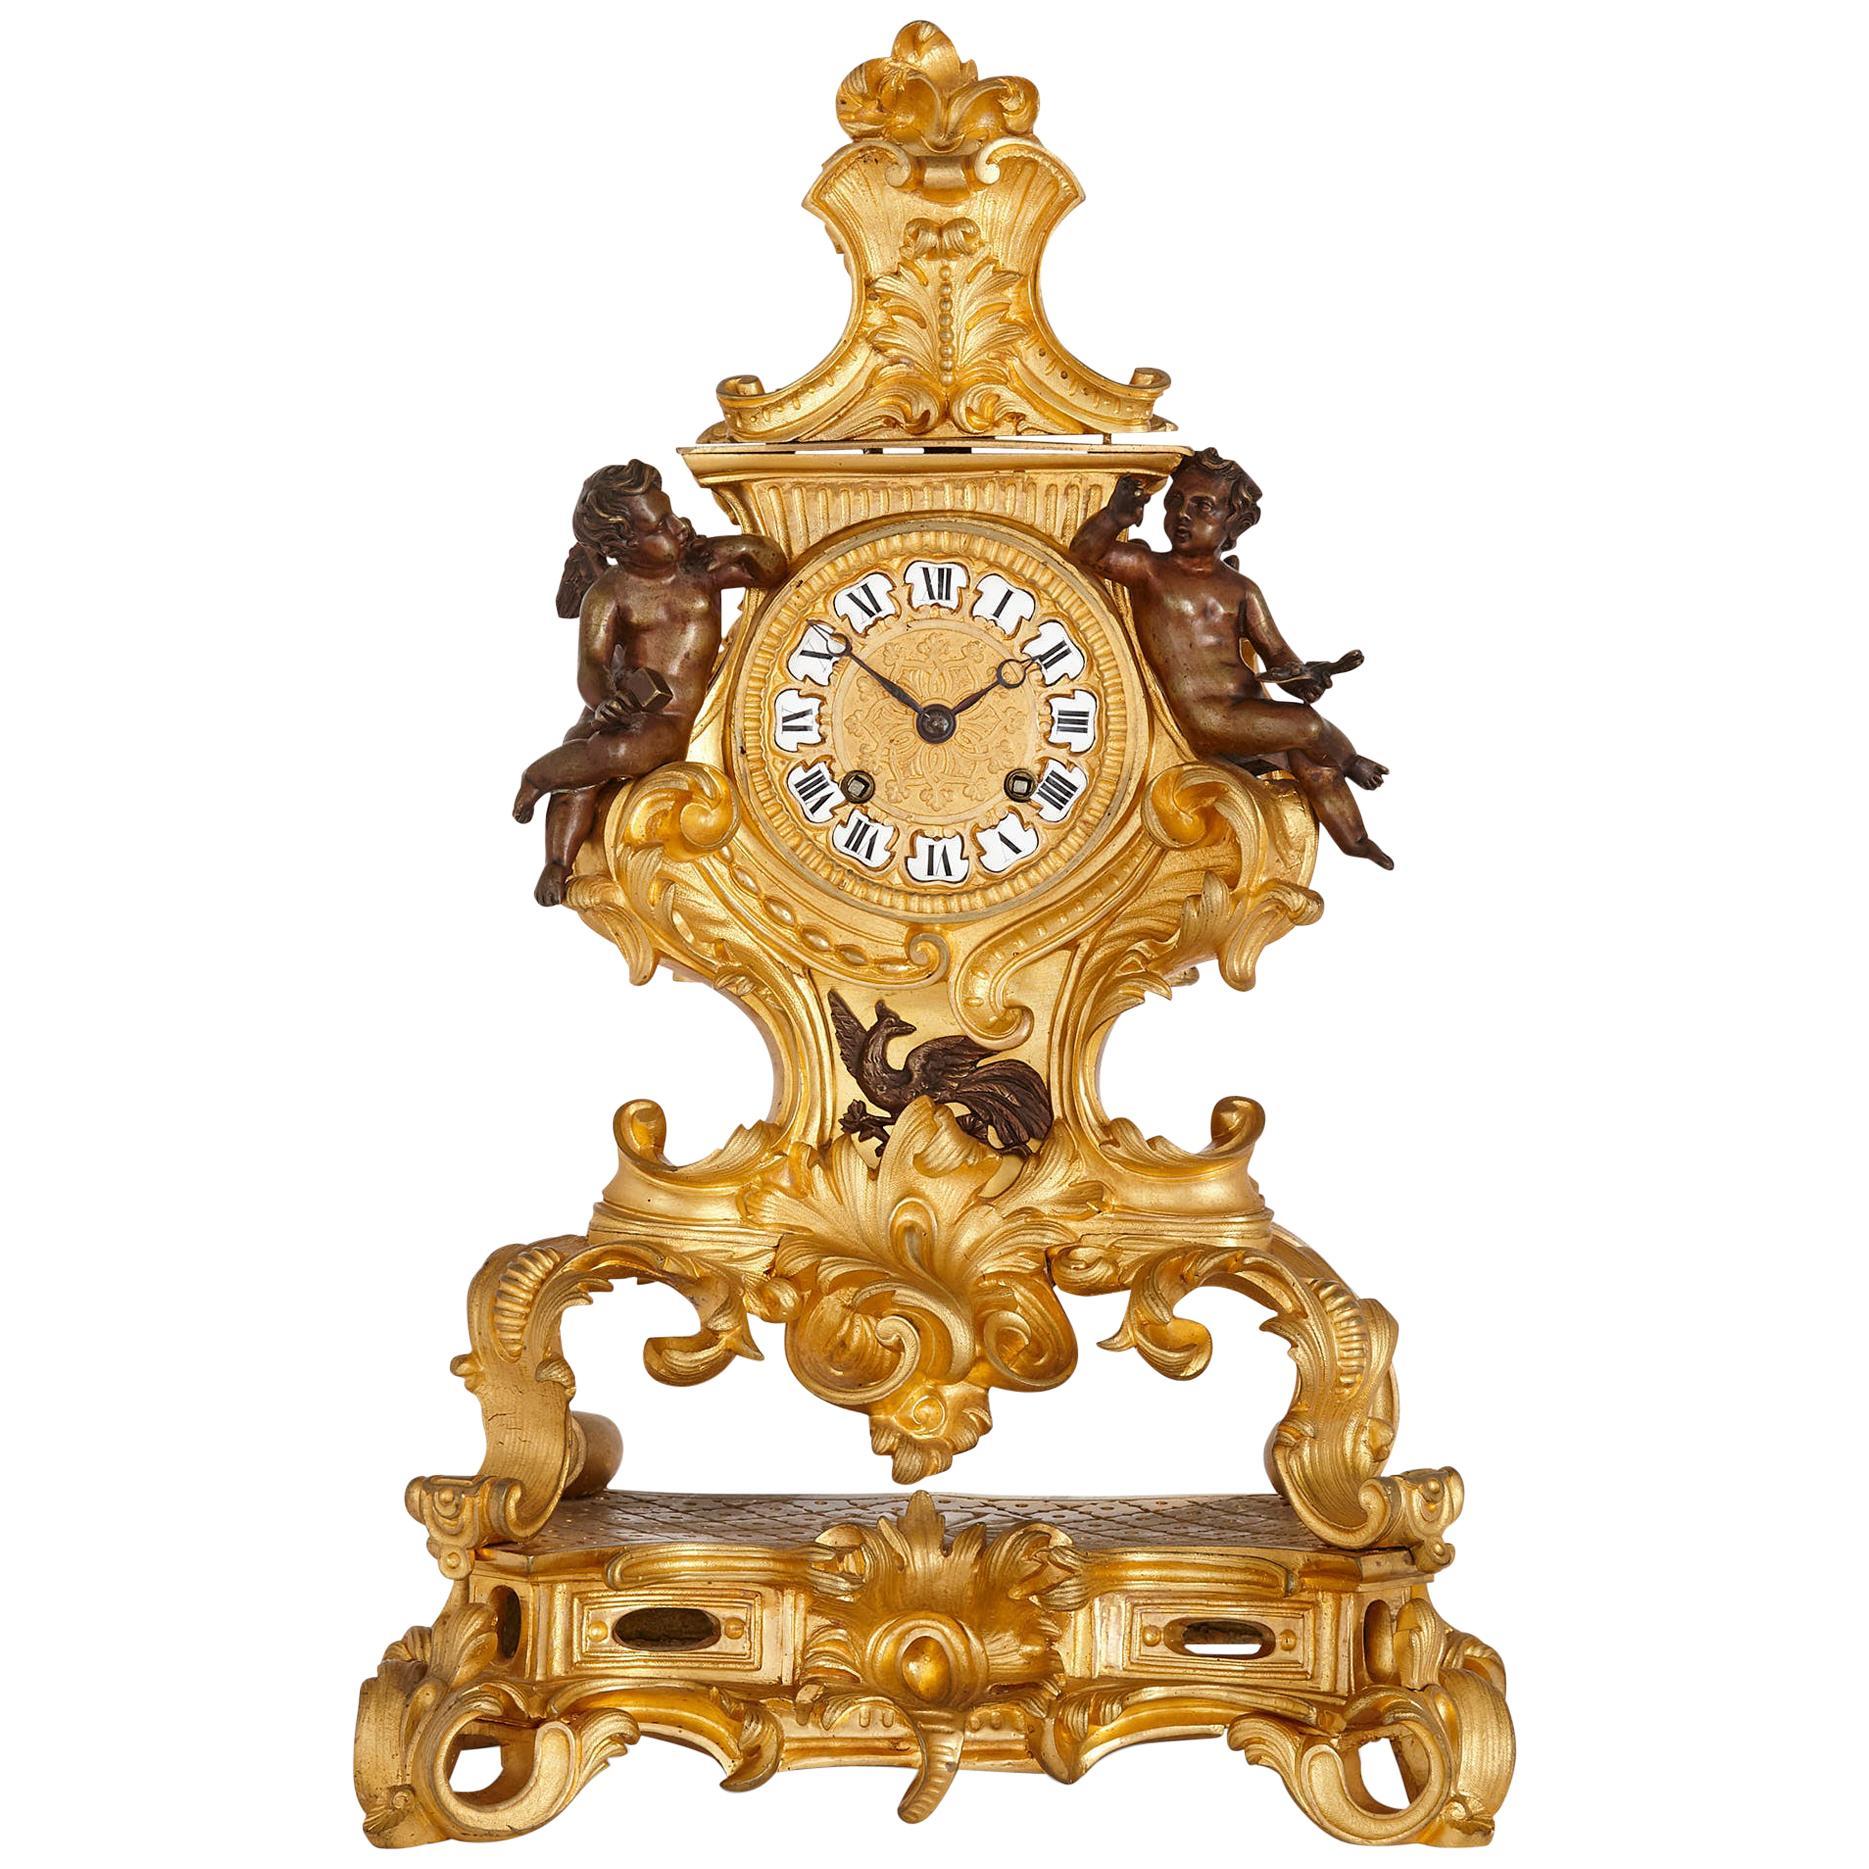 Rococo Style Ormolu Mantel Clock with Putti